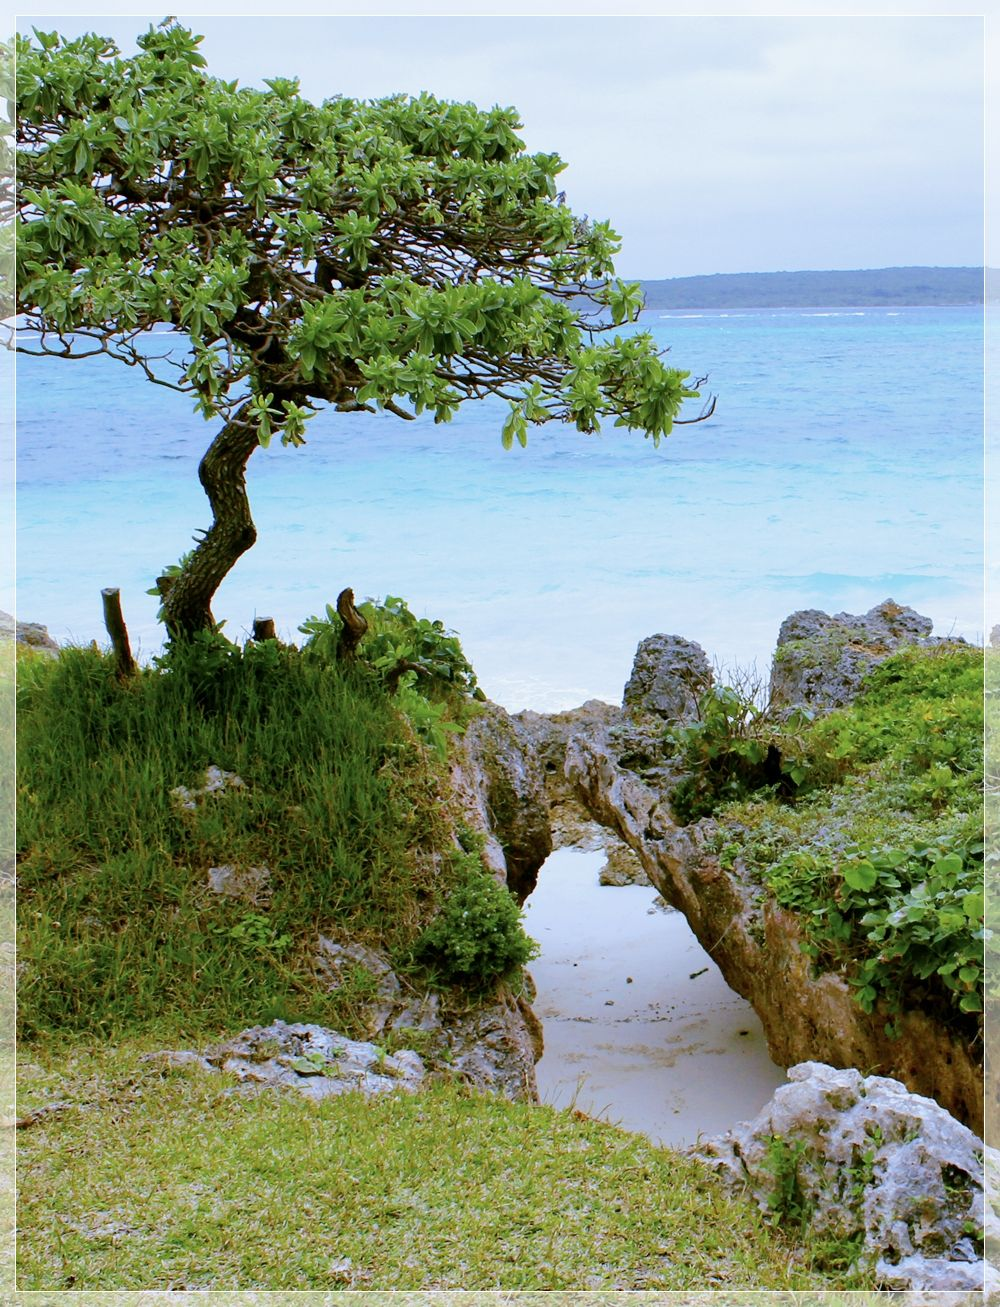 Travelling Tips For Non Travellers Lifou Island: Lifou, Loyalty Islands, New Caledonia